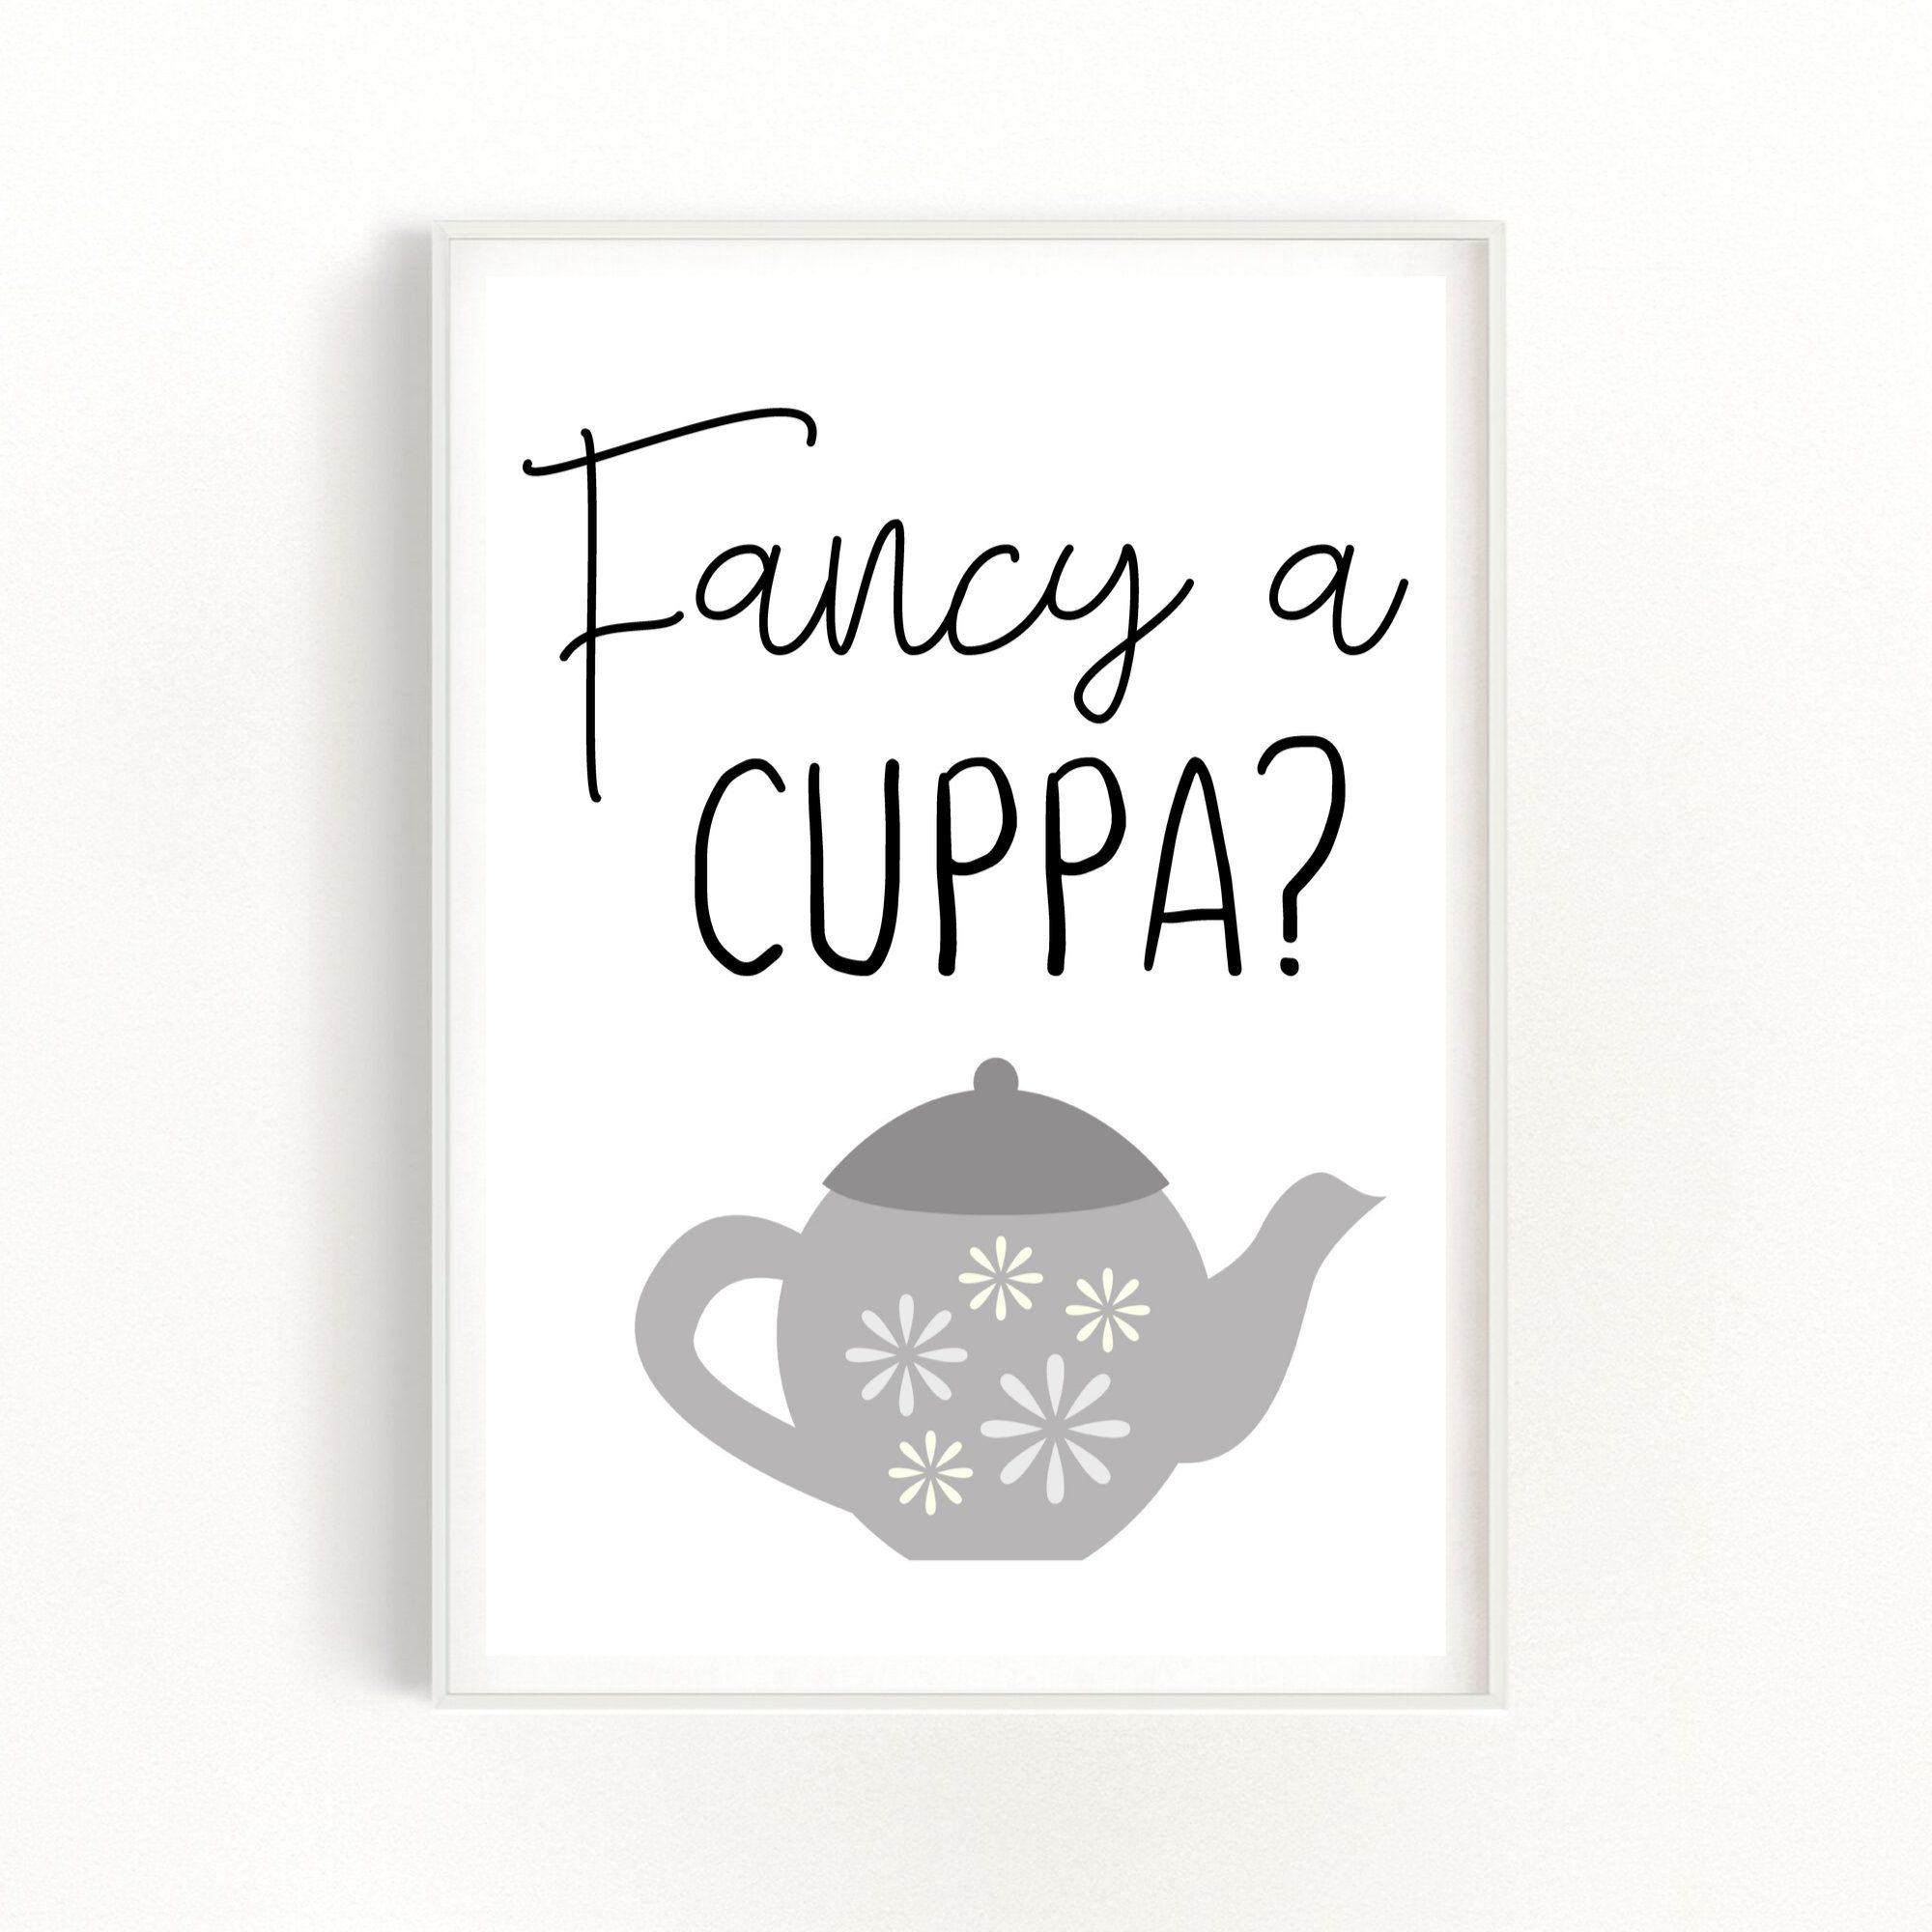 Kitchen Art Print, Fancy a Cuppa, Tea Drinking Gifts, Grey Kitchen Decor, Tea Wall Art #cuppatea